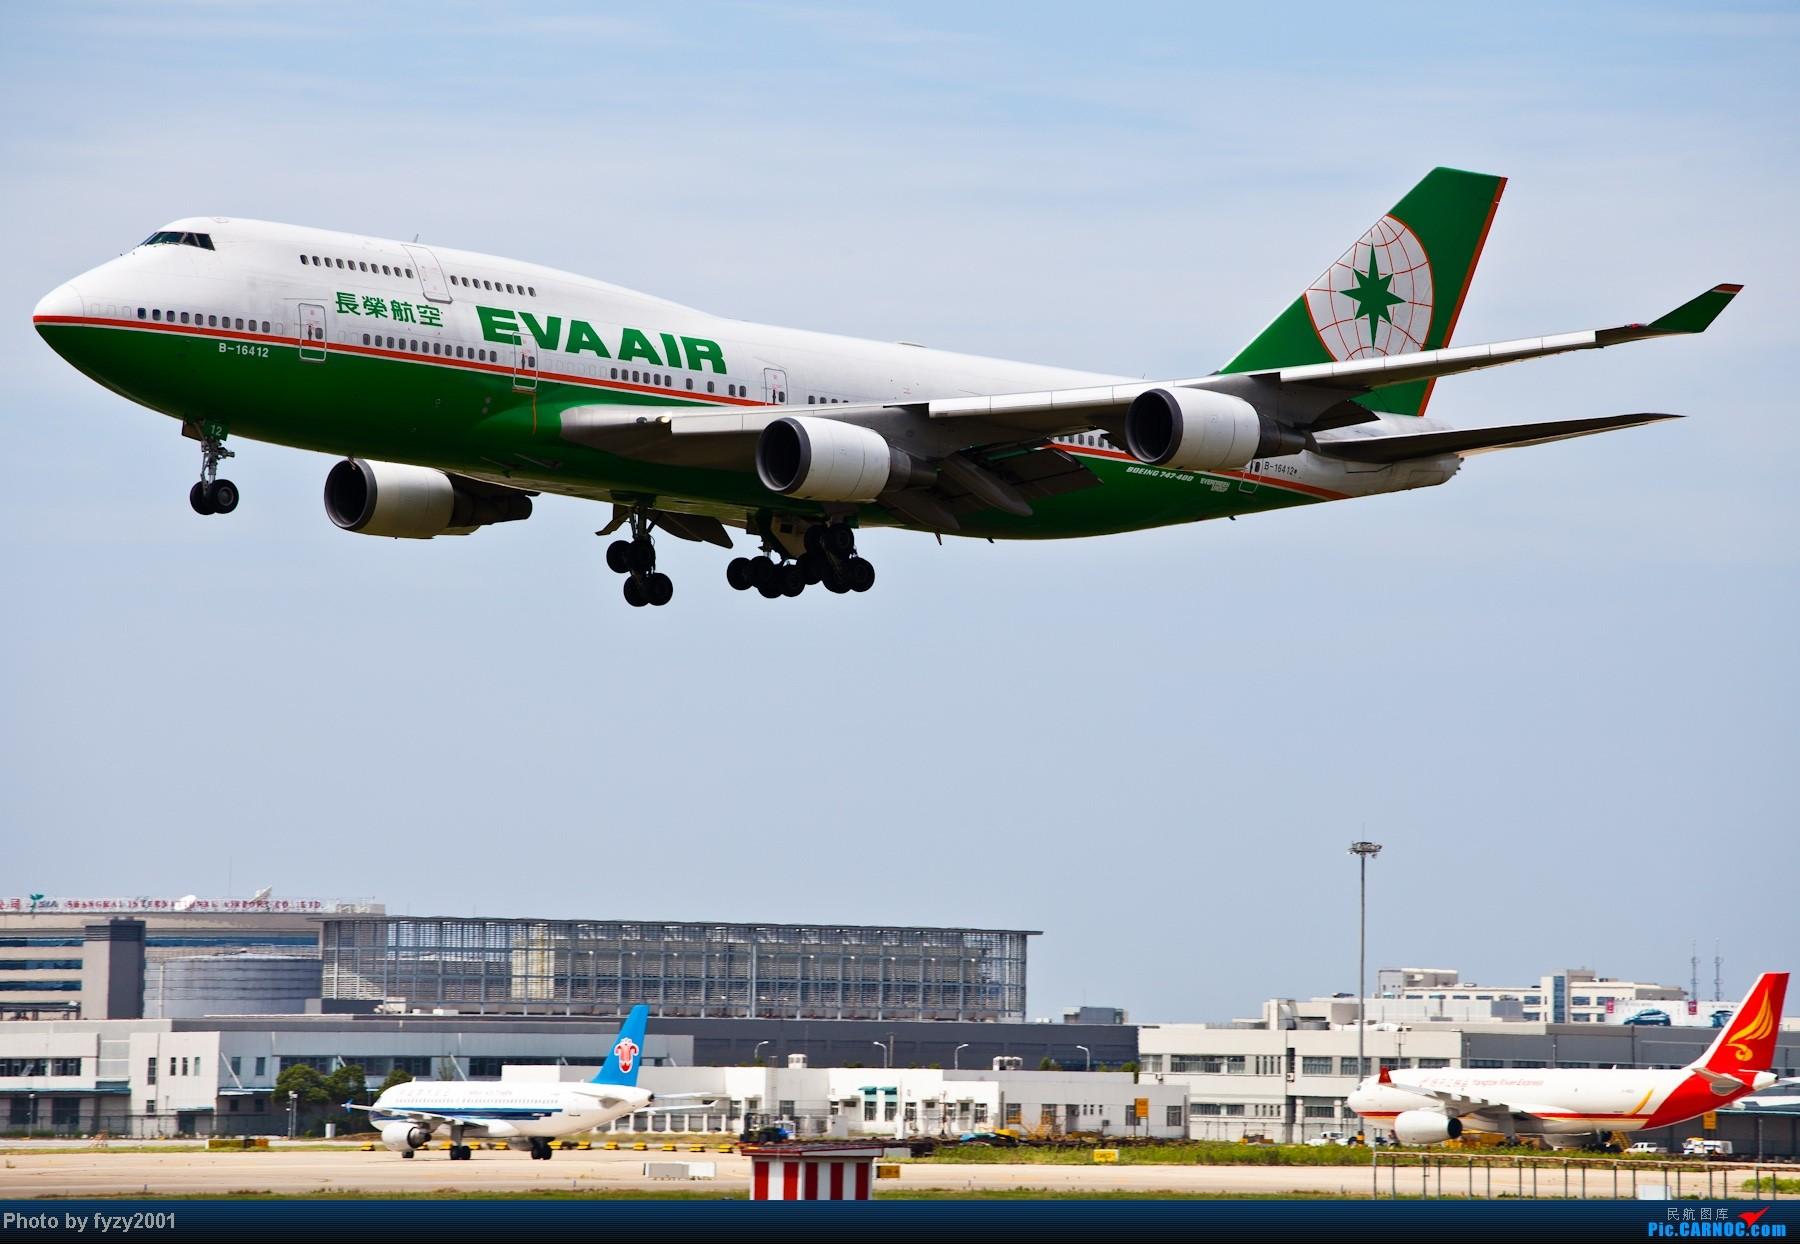 Re:[原创][无锡西站]一周之内SHA&PVG追逐美好光线……多图党,不知你的电脑能承受多少张1800(更新ing)~~~~~ BOEING 747-400 B-16412 中国上海浦东机场